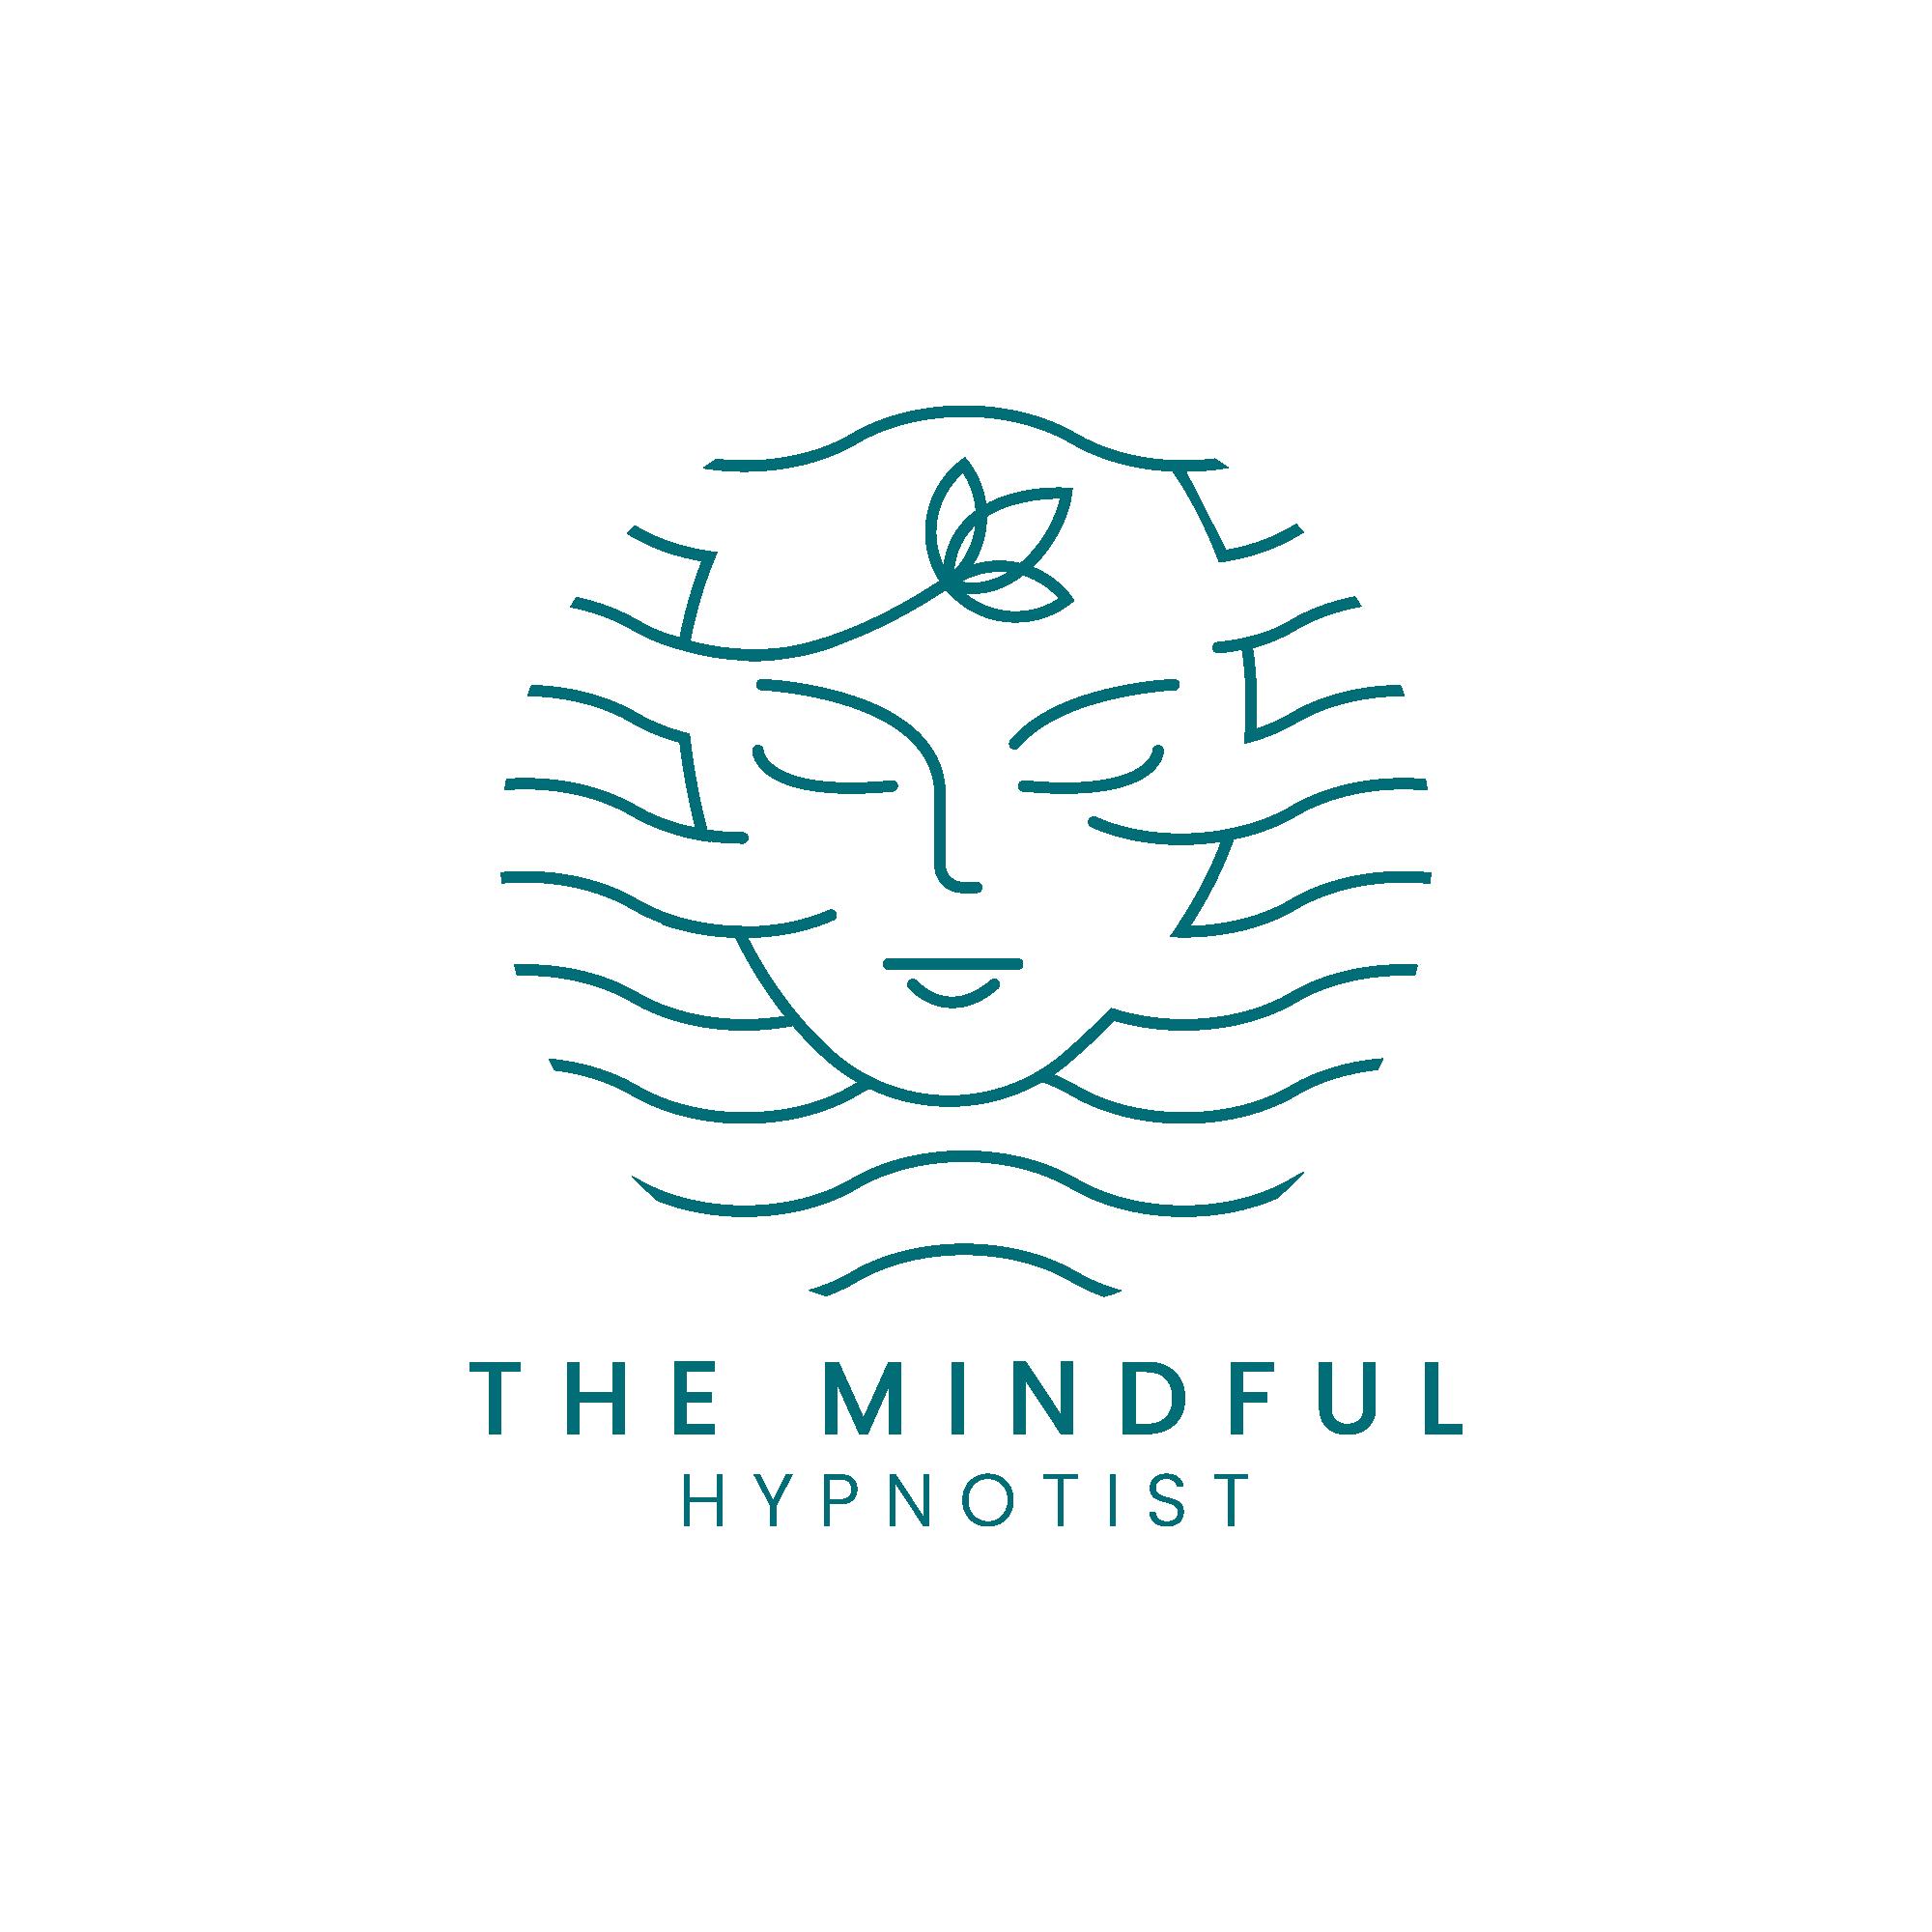 The Mindful Hypnotist